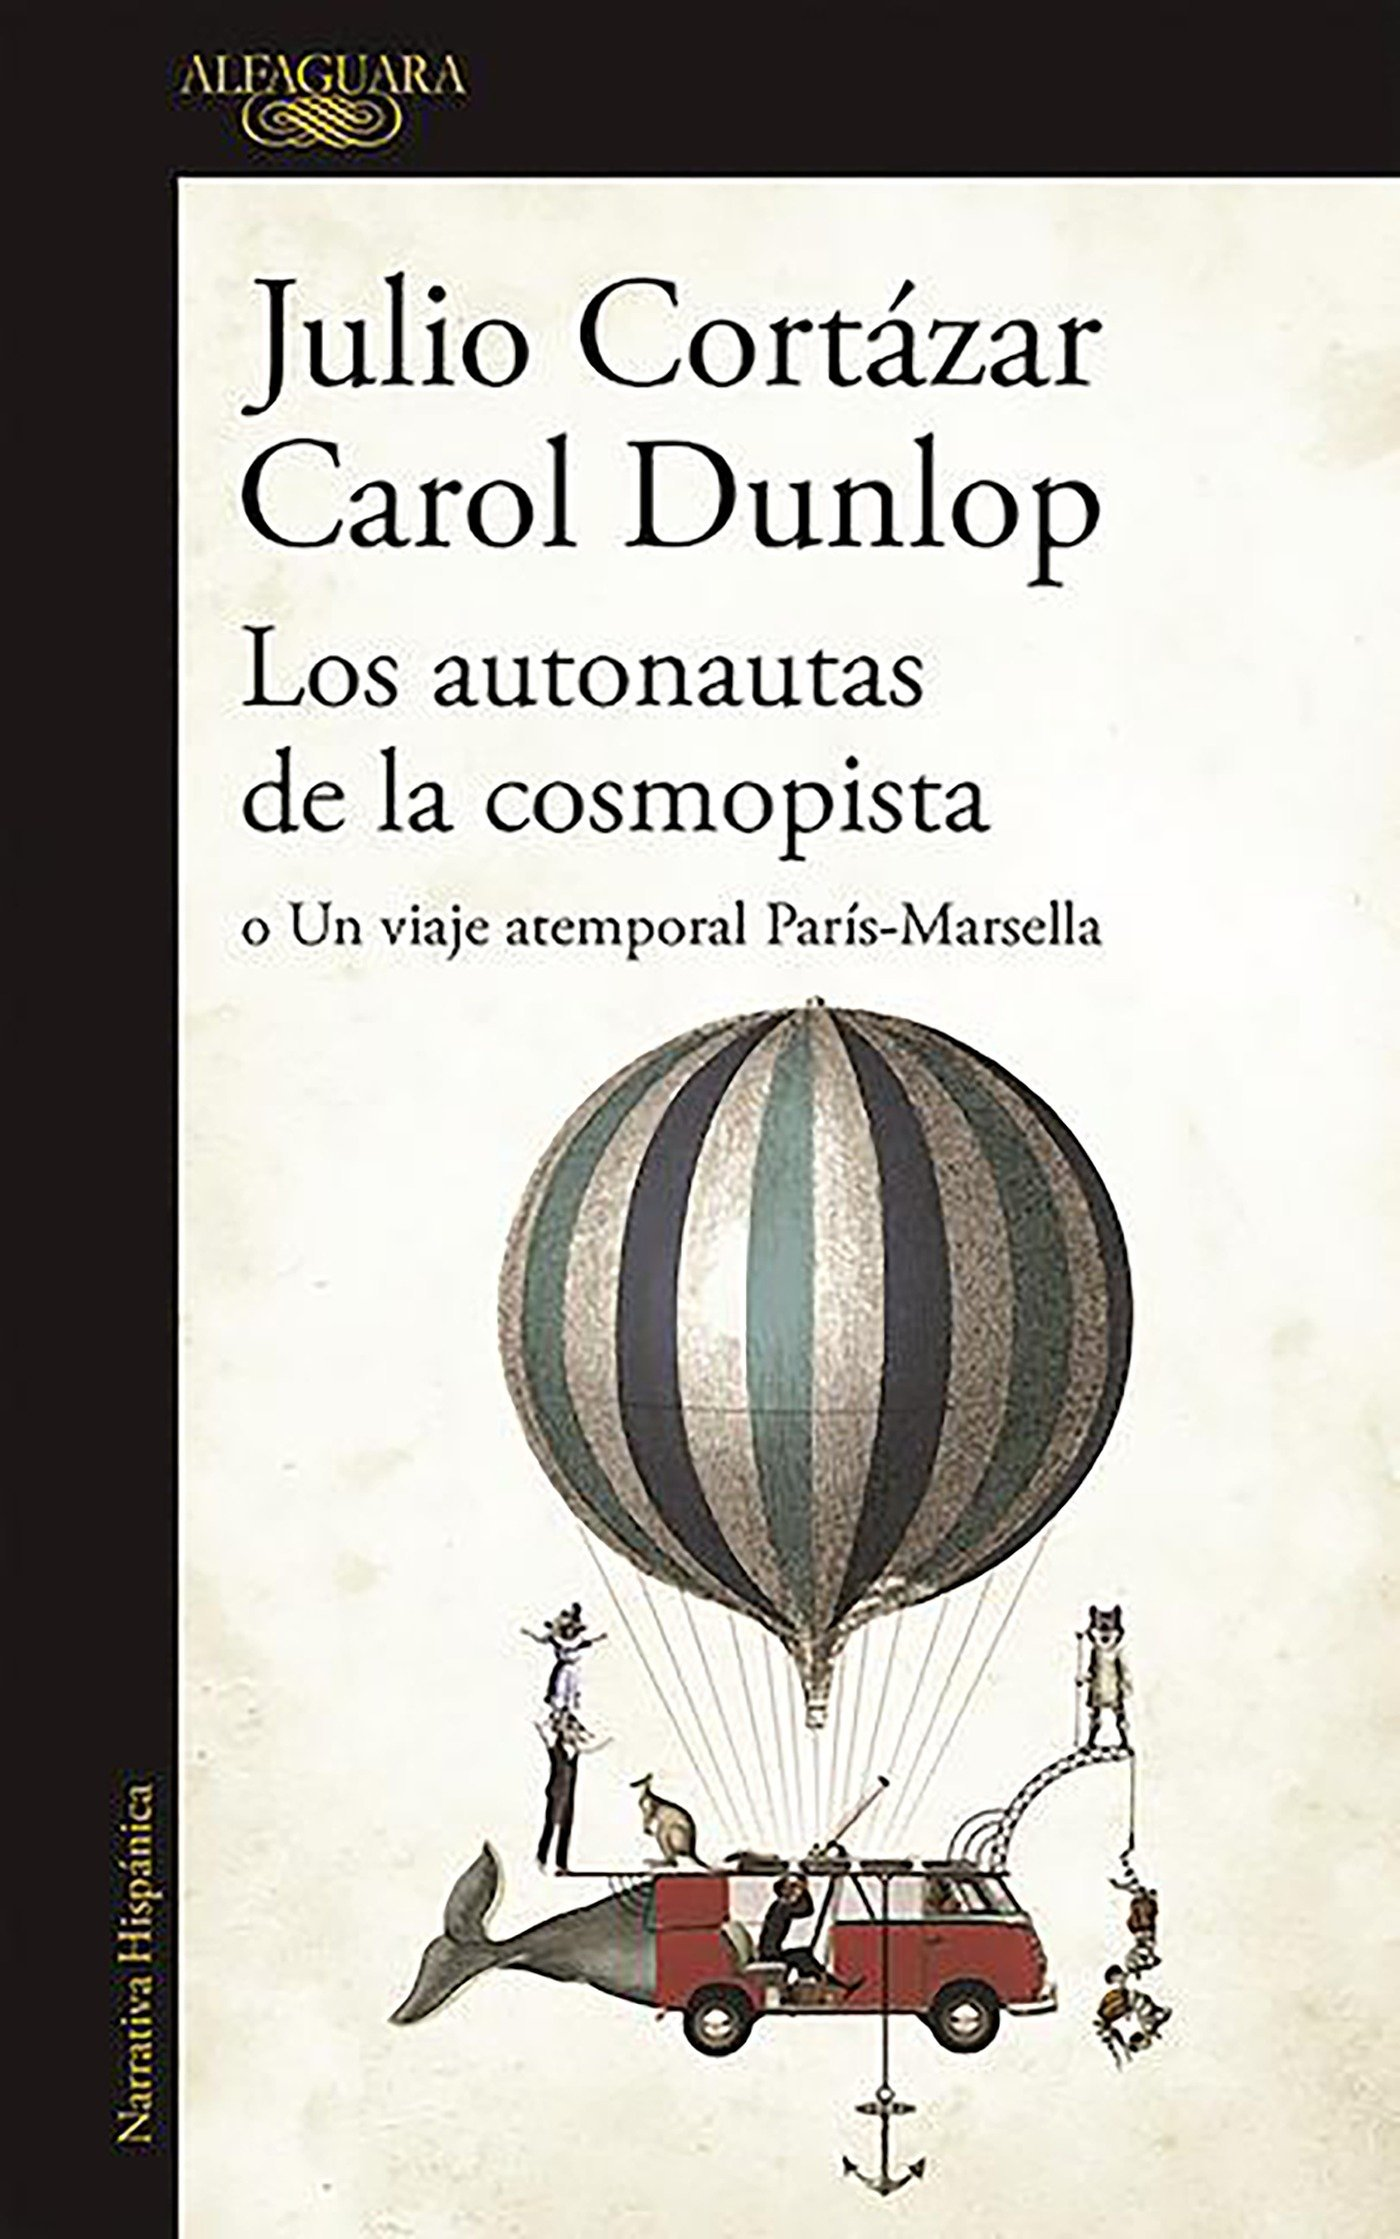 Autonautas de La Cosmopista / The Autonauts of the Cosmoroute, Los